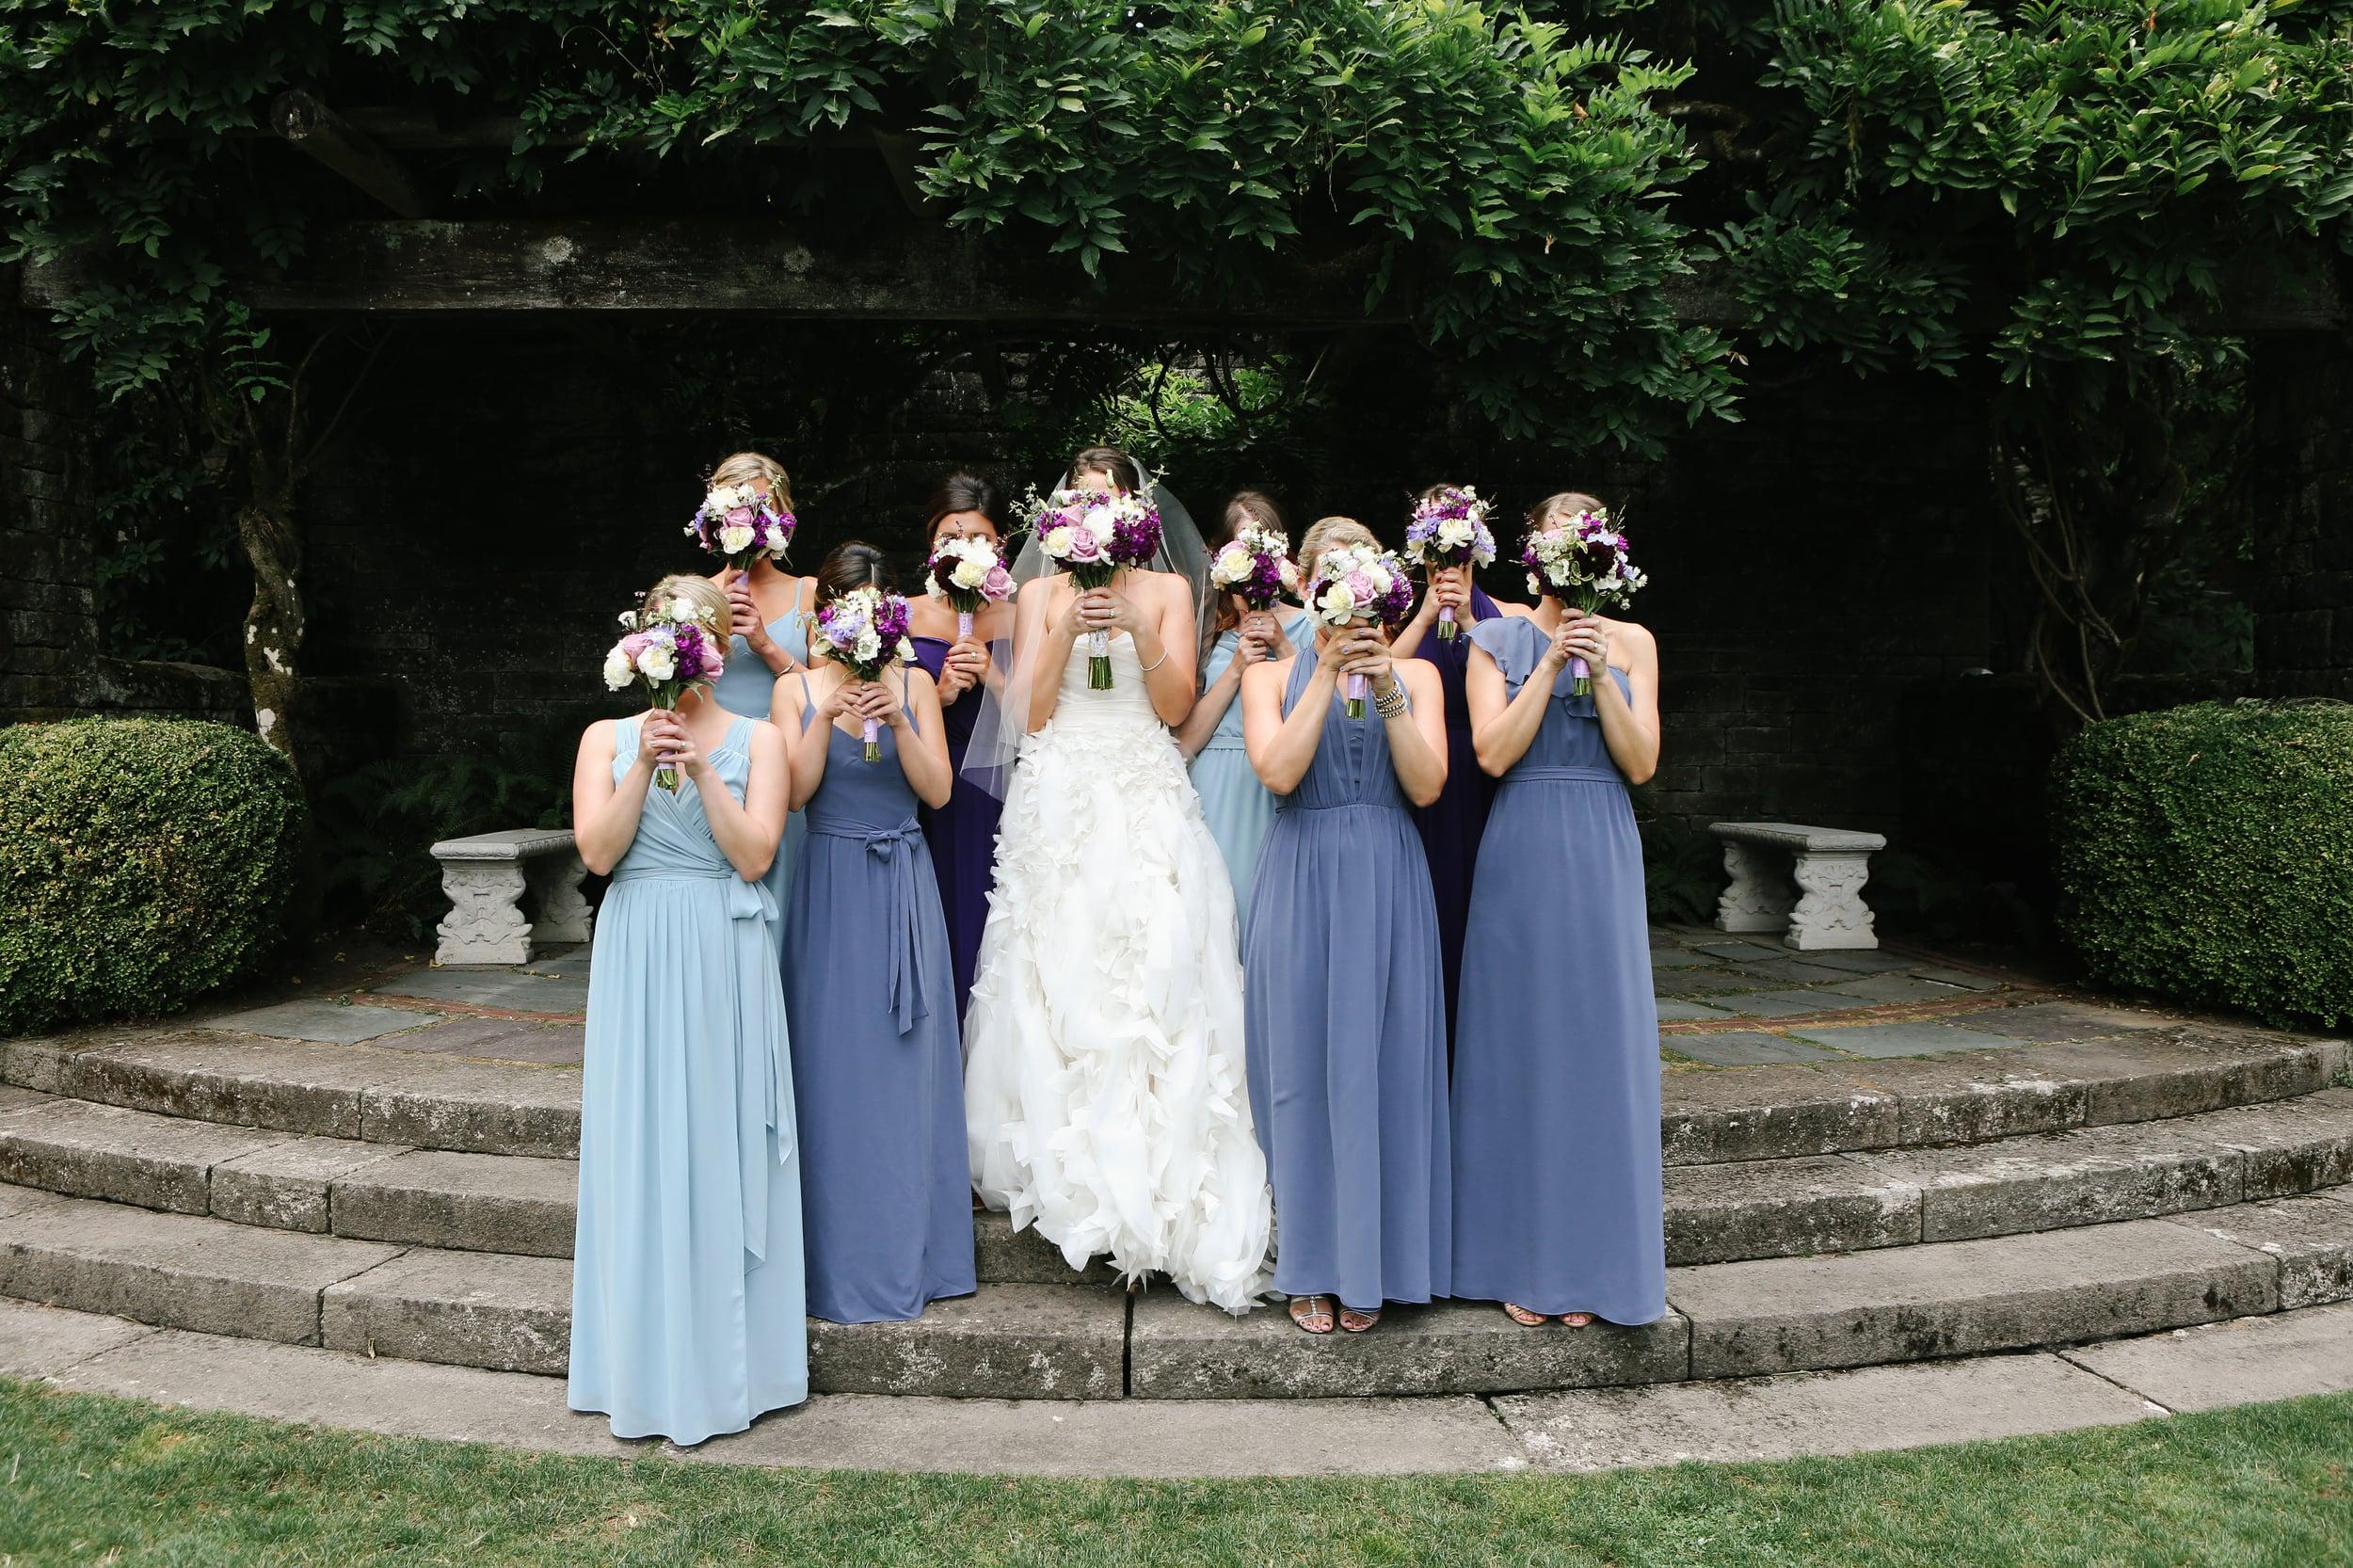 S&S - Love Lit Wedding Photography-19.jpg